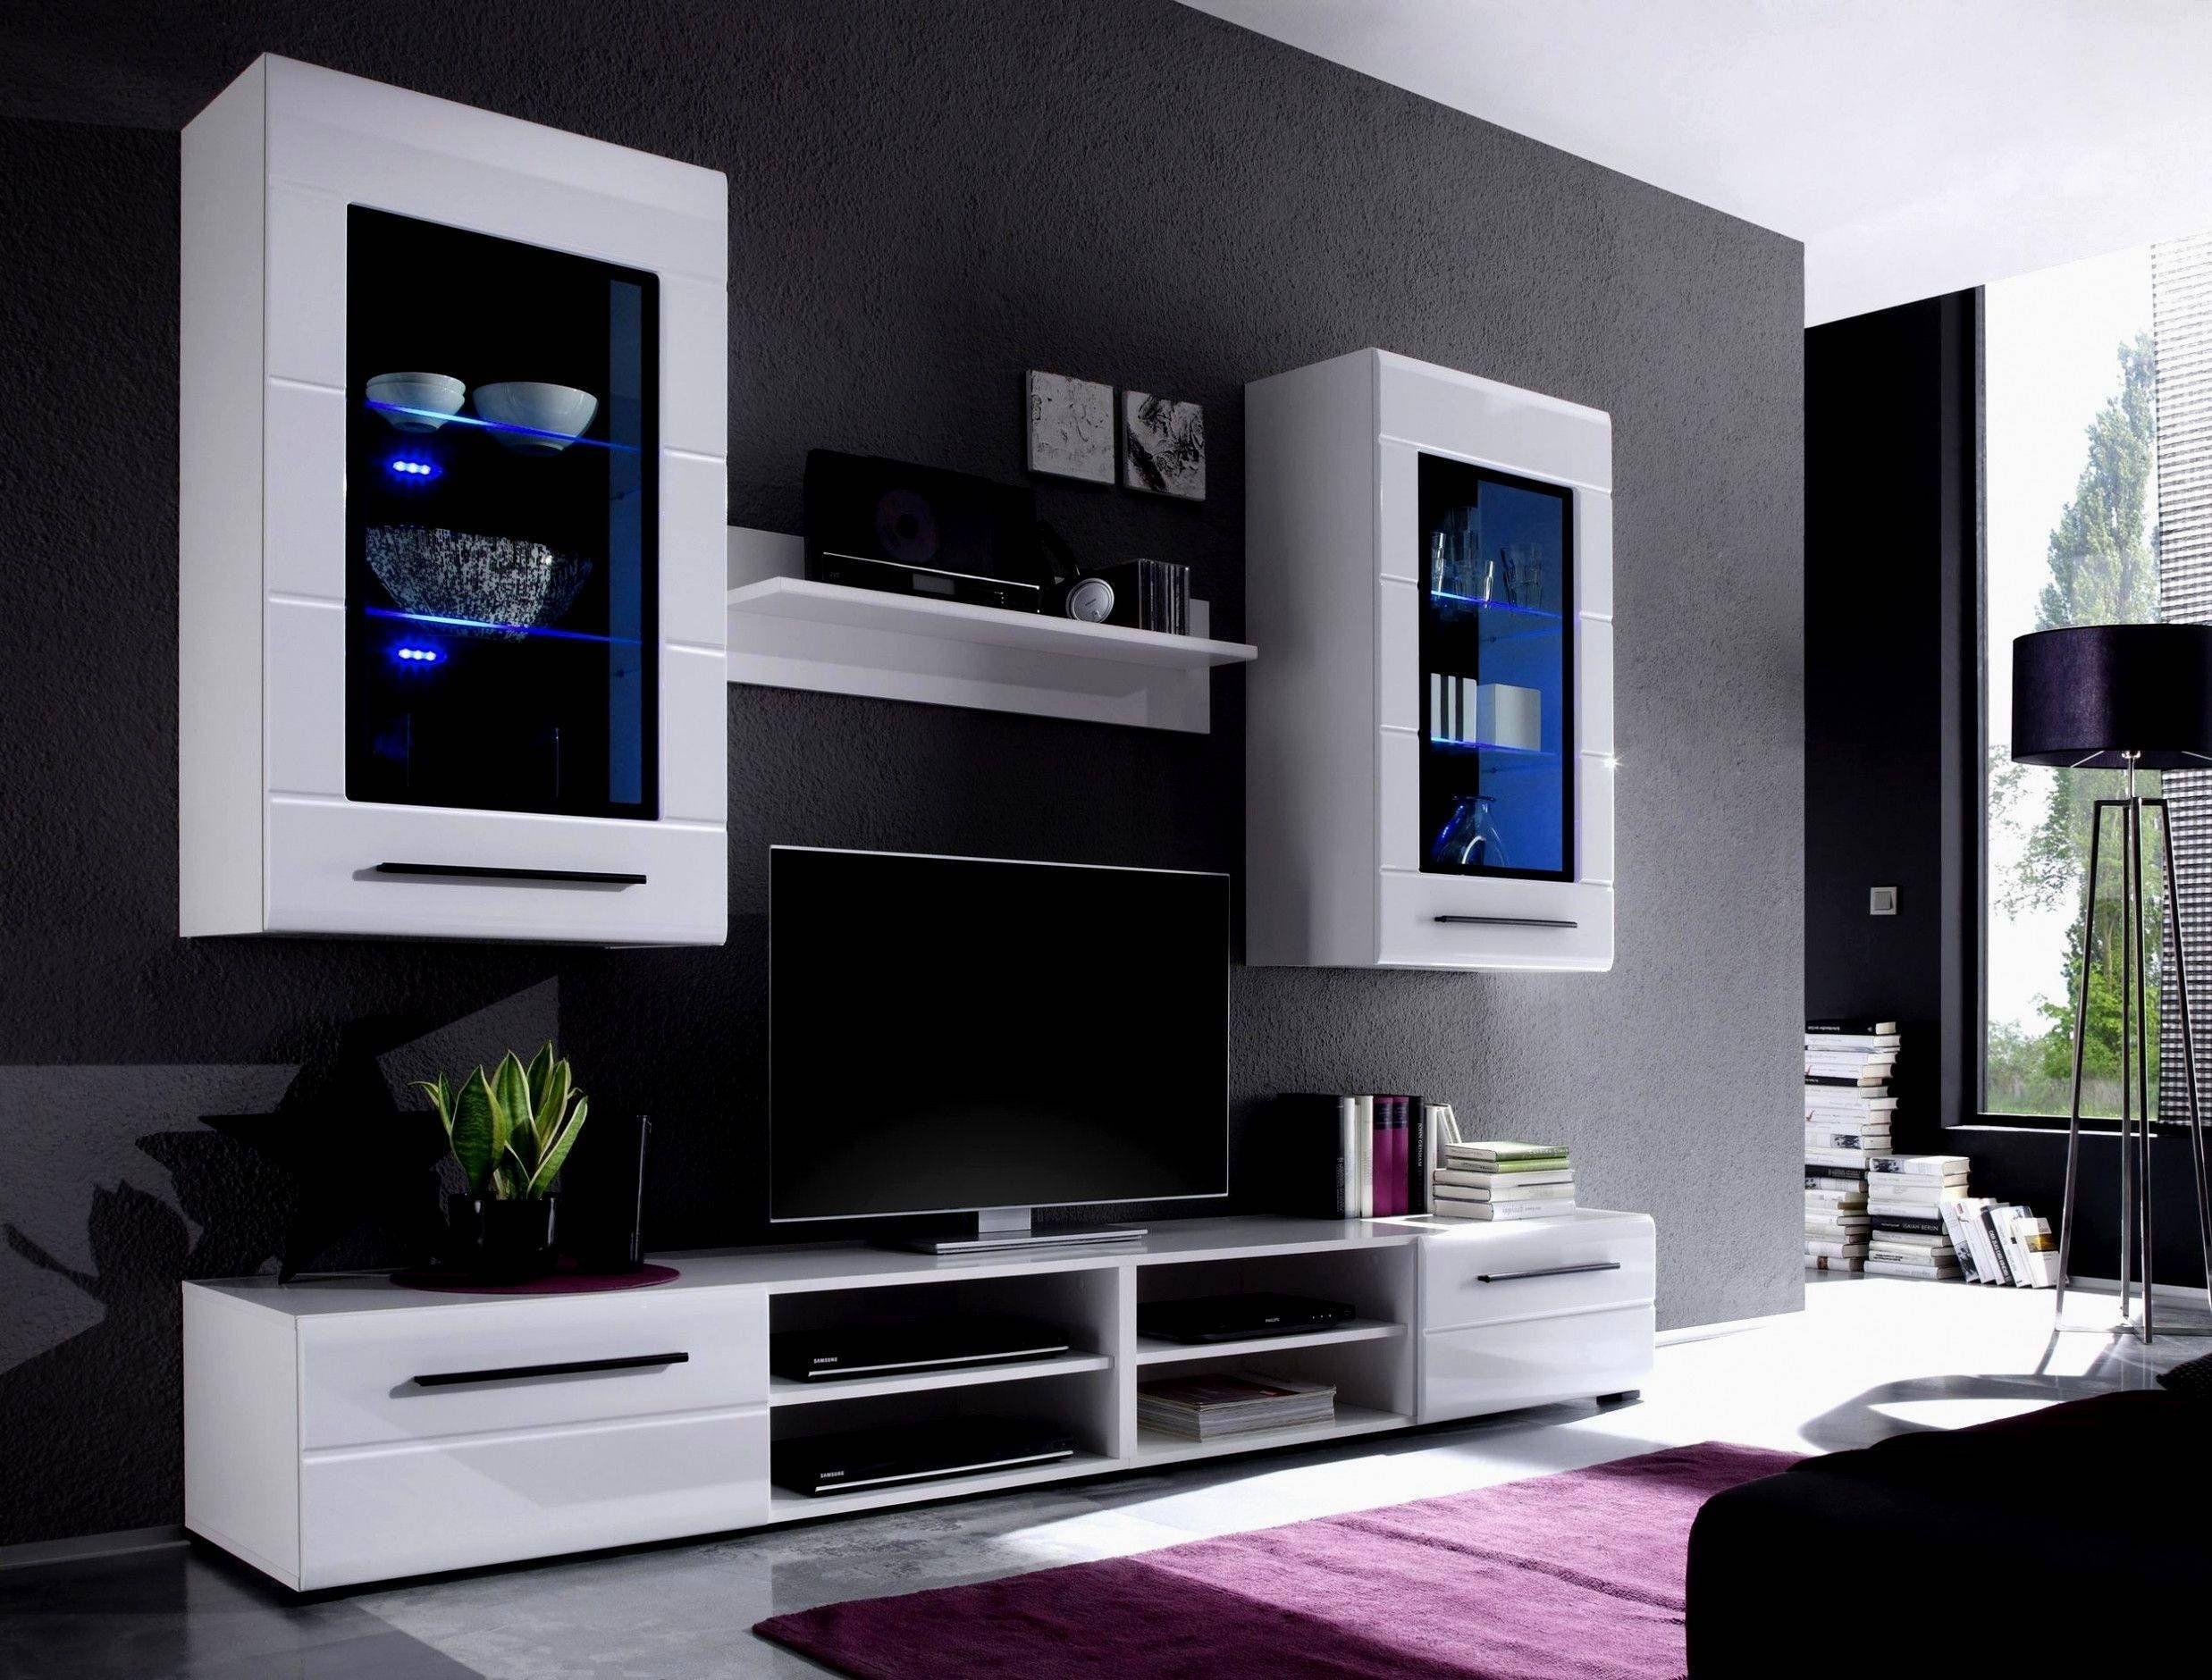 Tv In Master Bedroom Inspirational Tv Schrank Poco In 2020 Gold Living Room Decor Master Bedroom Girl Bedroom Decor